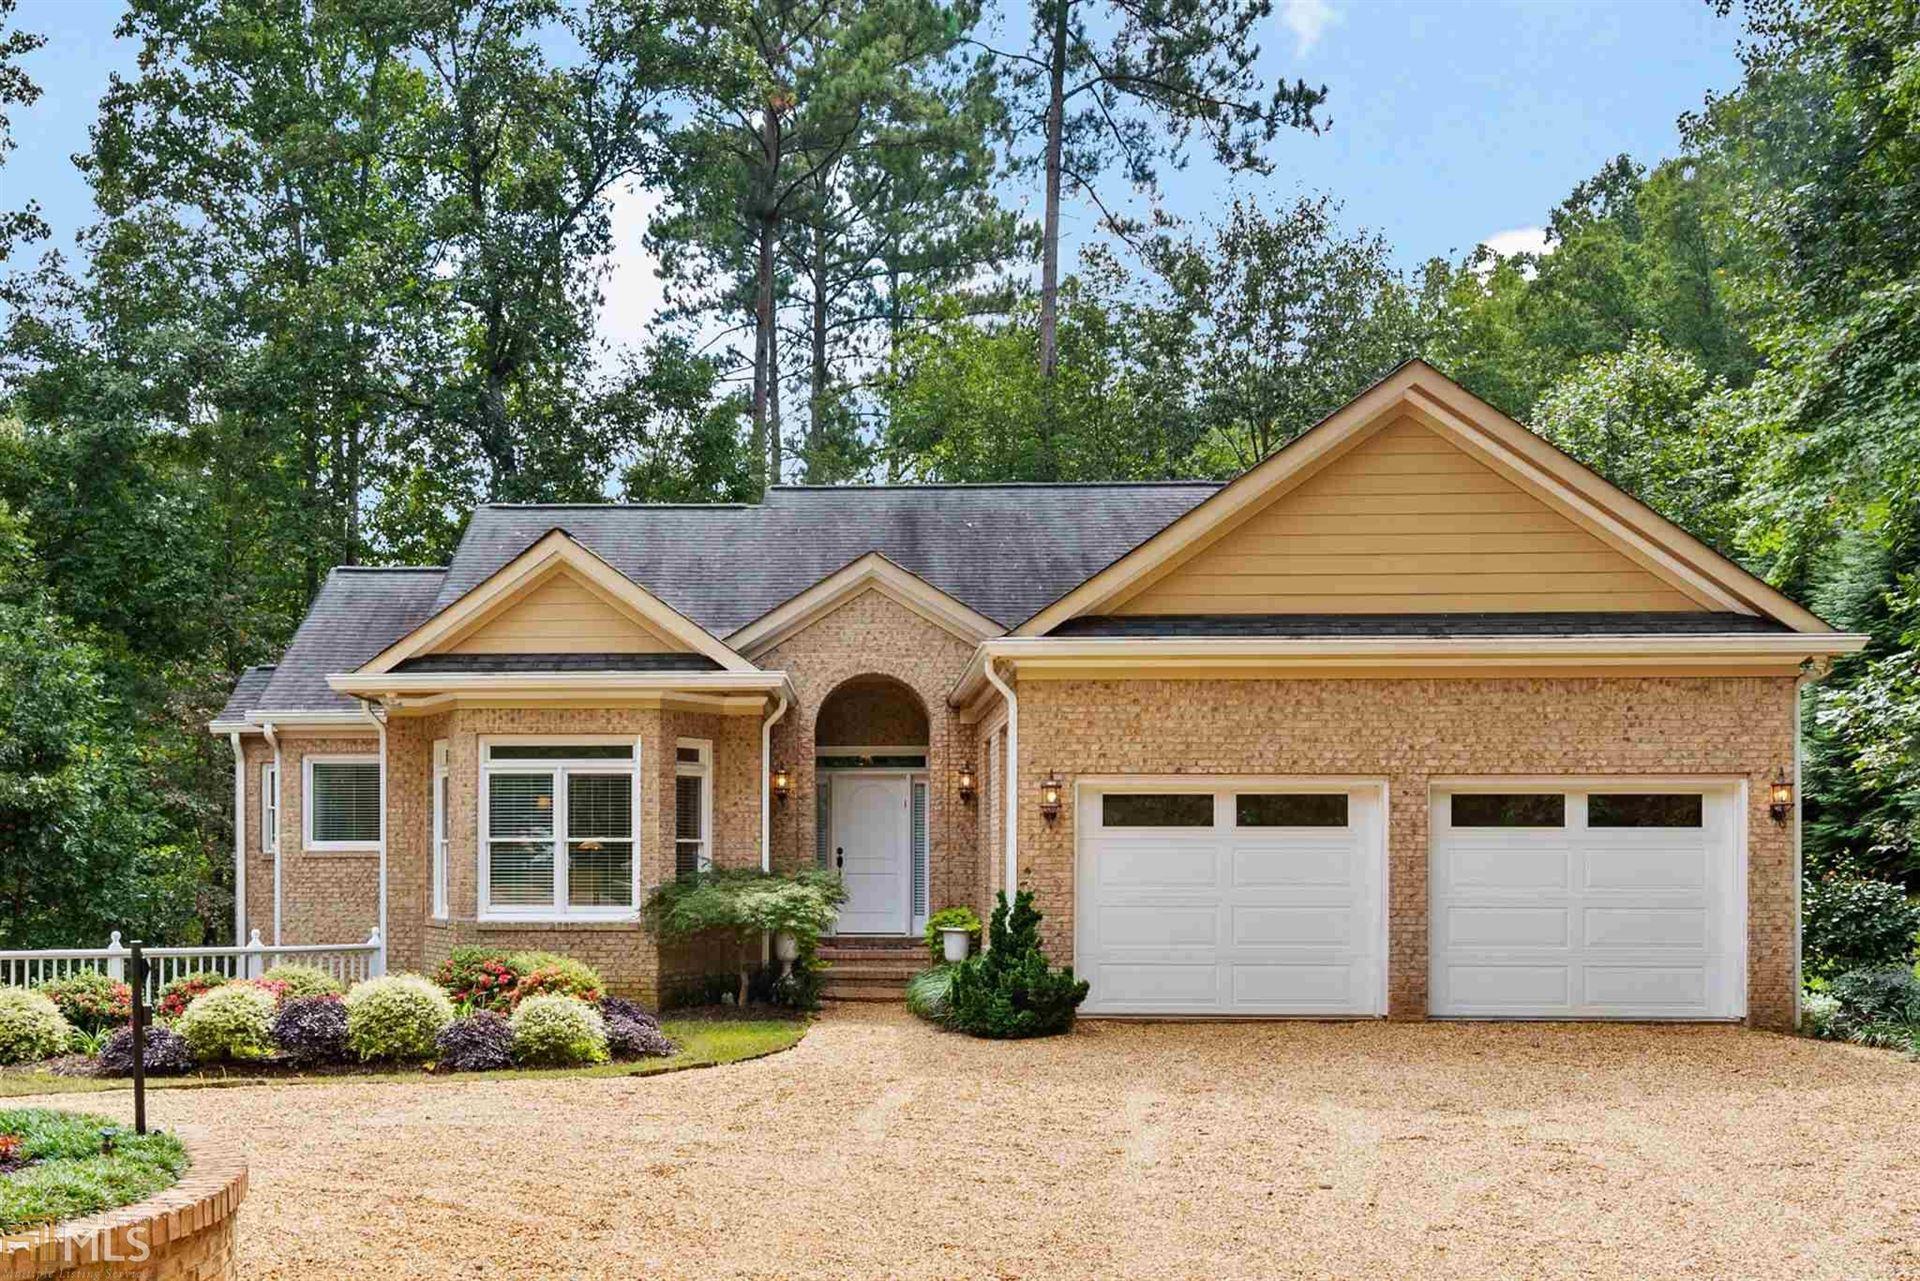 4910 Chestatee Heights Rd, Gainesville, GA 30506 - MLS#: 8873788